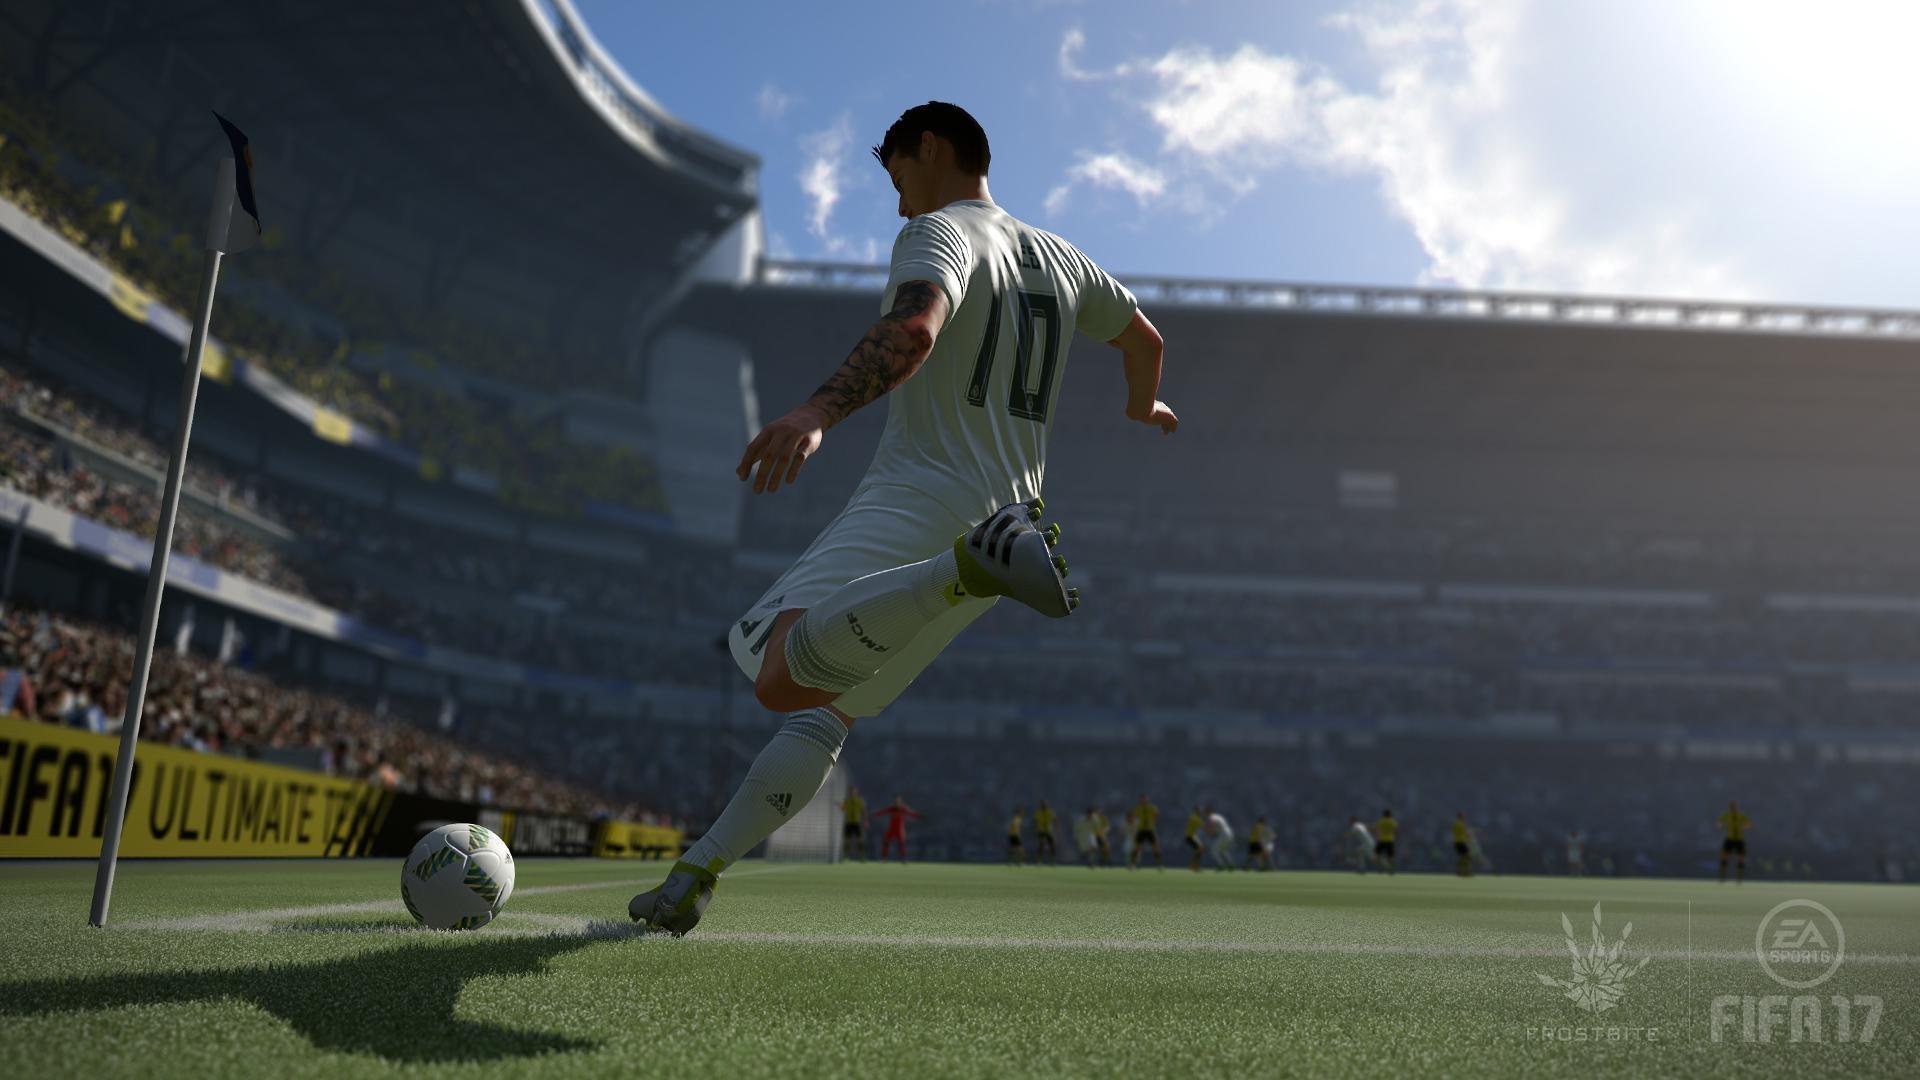 《FIFA 17》IGN评分8.4